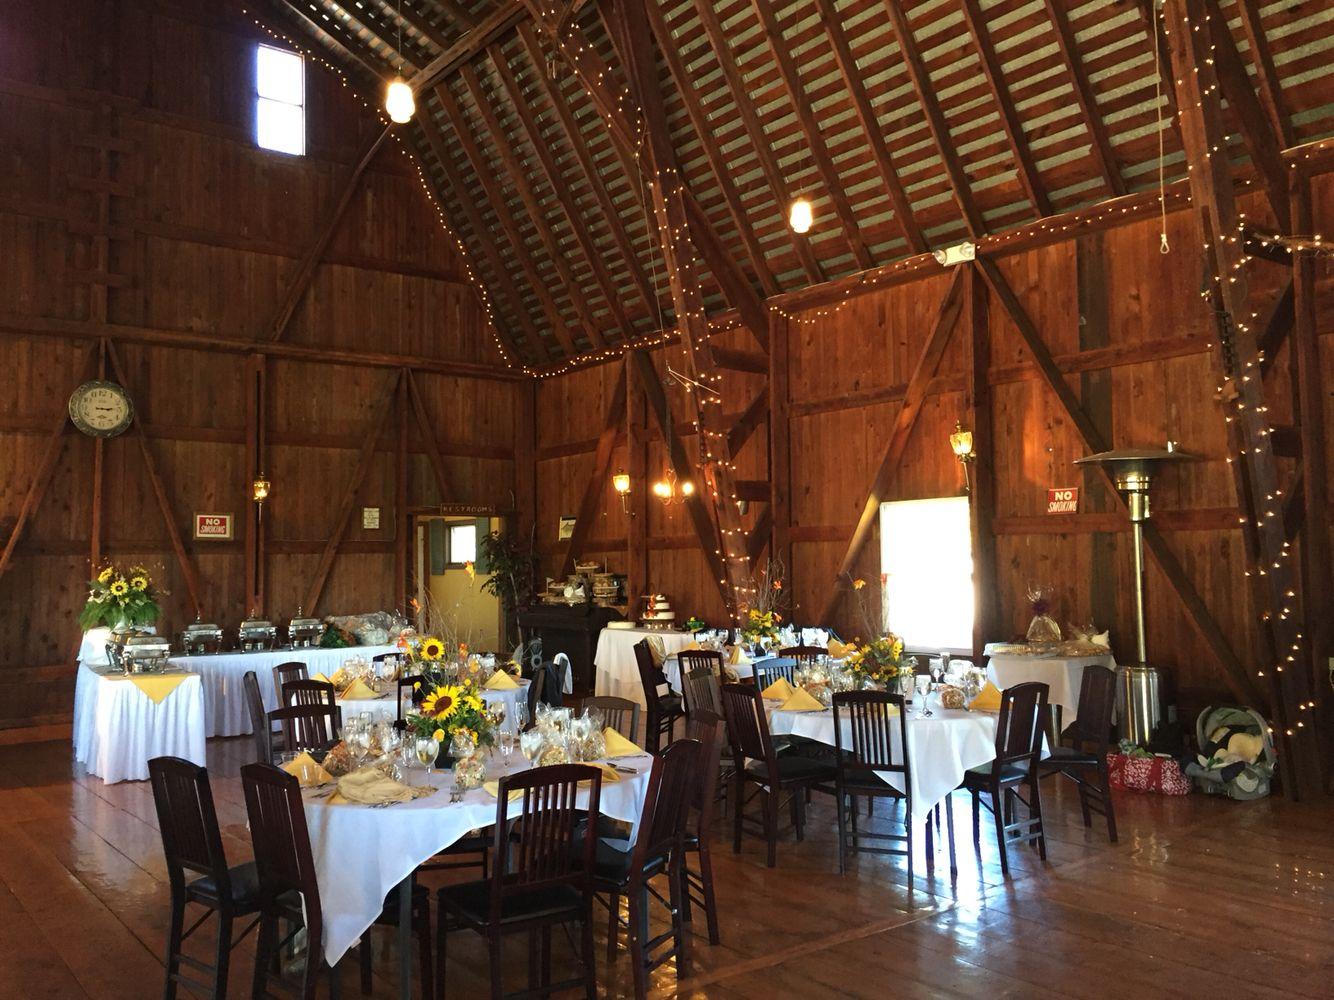 Barn Weddings. The Barn at Hillsprings Farm is the perfect